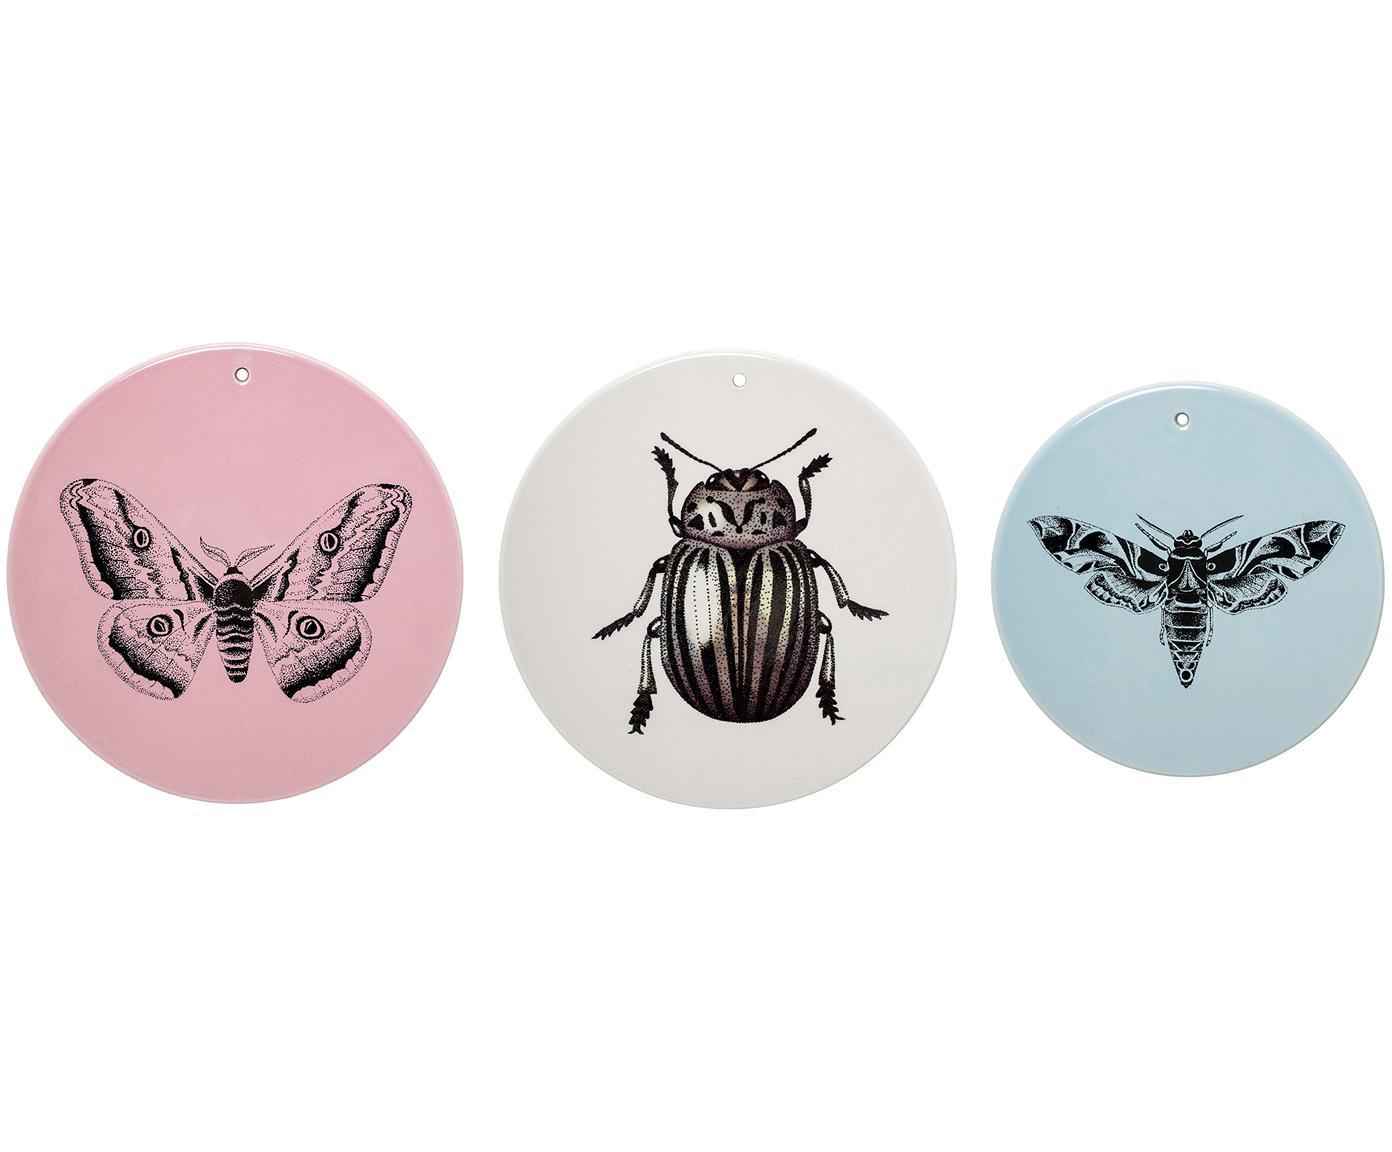 Wandobjectenset Fauna, 3-delig, Keramiek, Roze, beige, blauw, Ø 18 x D 1 cm